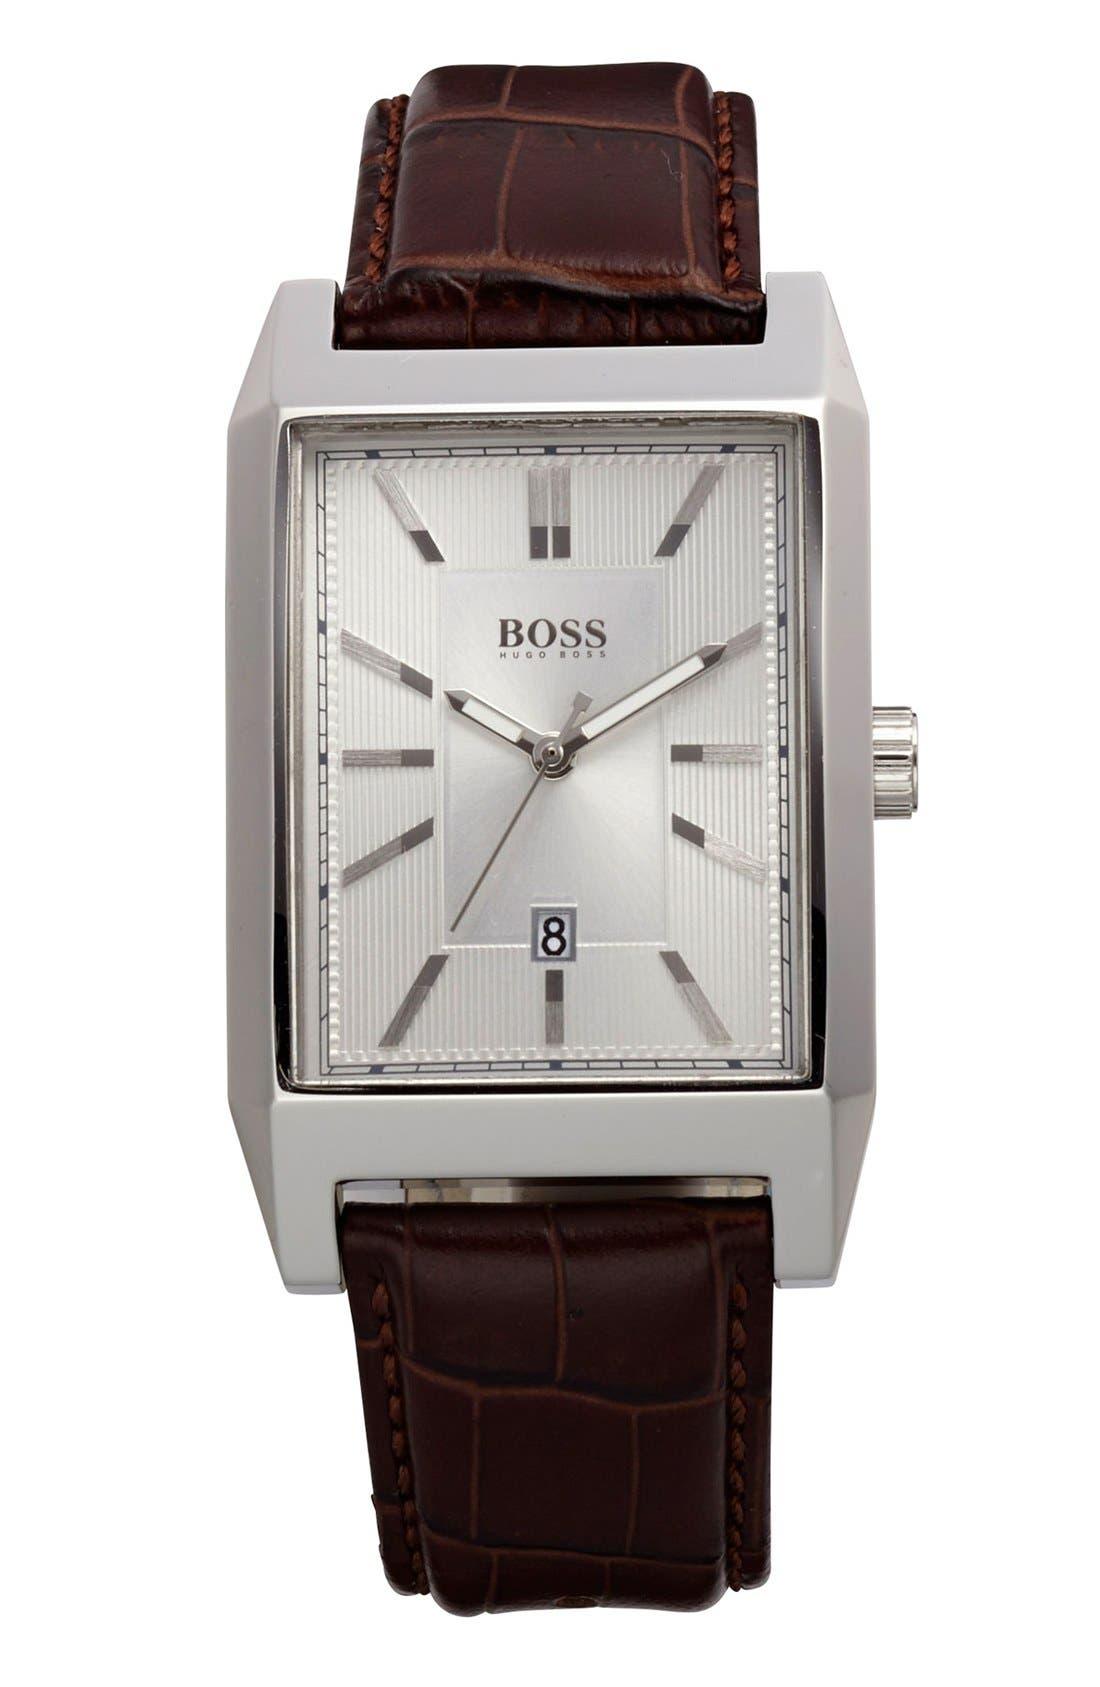 Alternate Image 1 Selected - BOSS HUGO BOSS Rectangular Leather Strap Watch, 22mm x 33mm